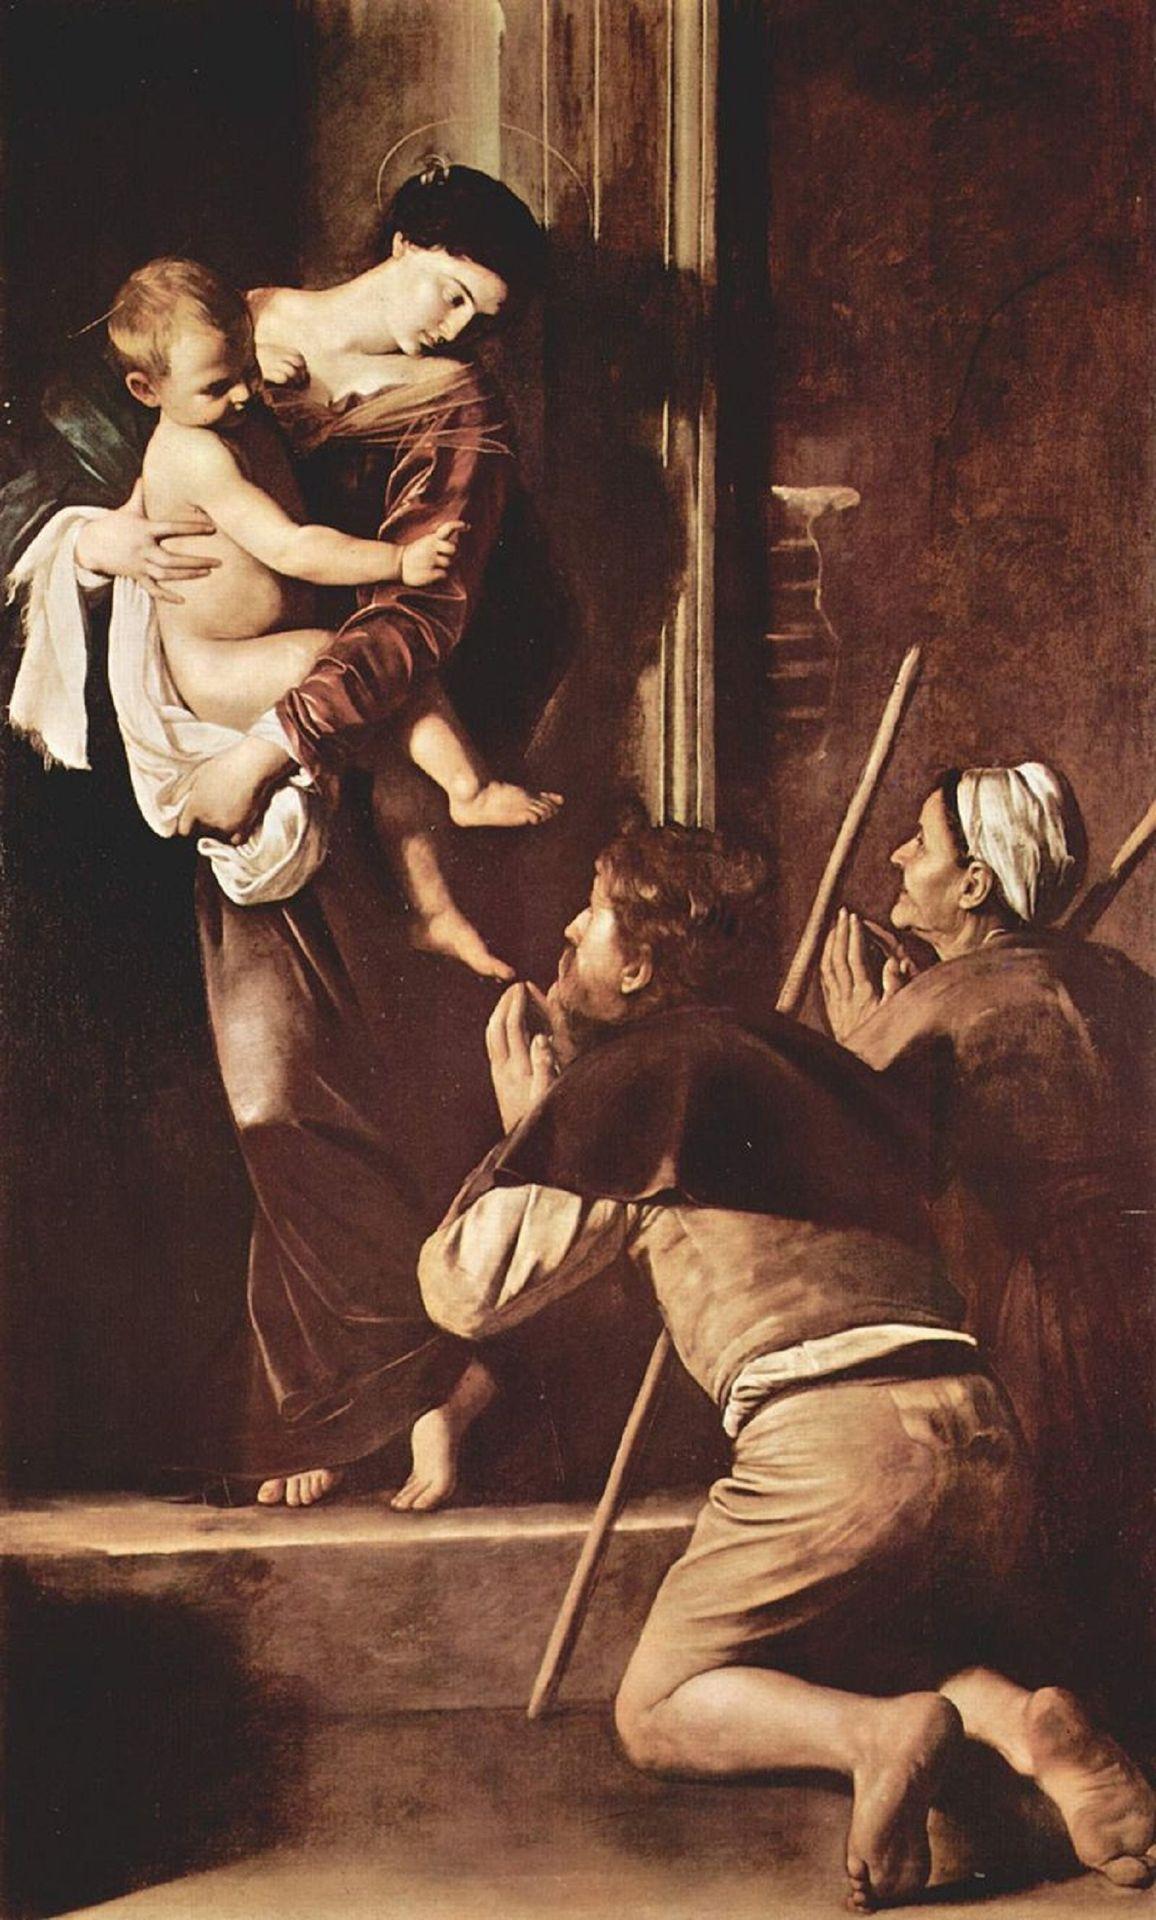 800px-Michelangelo_Caravaggio_001